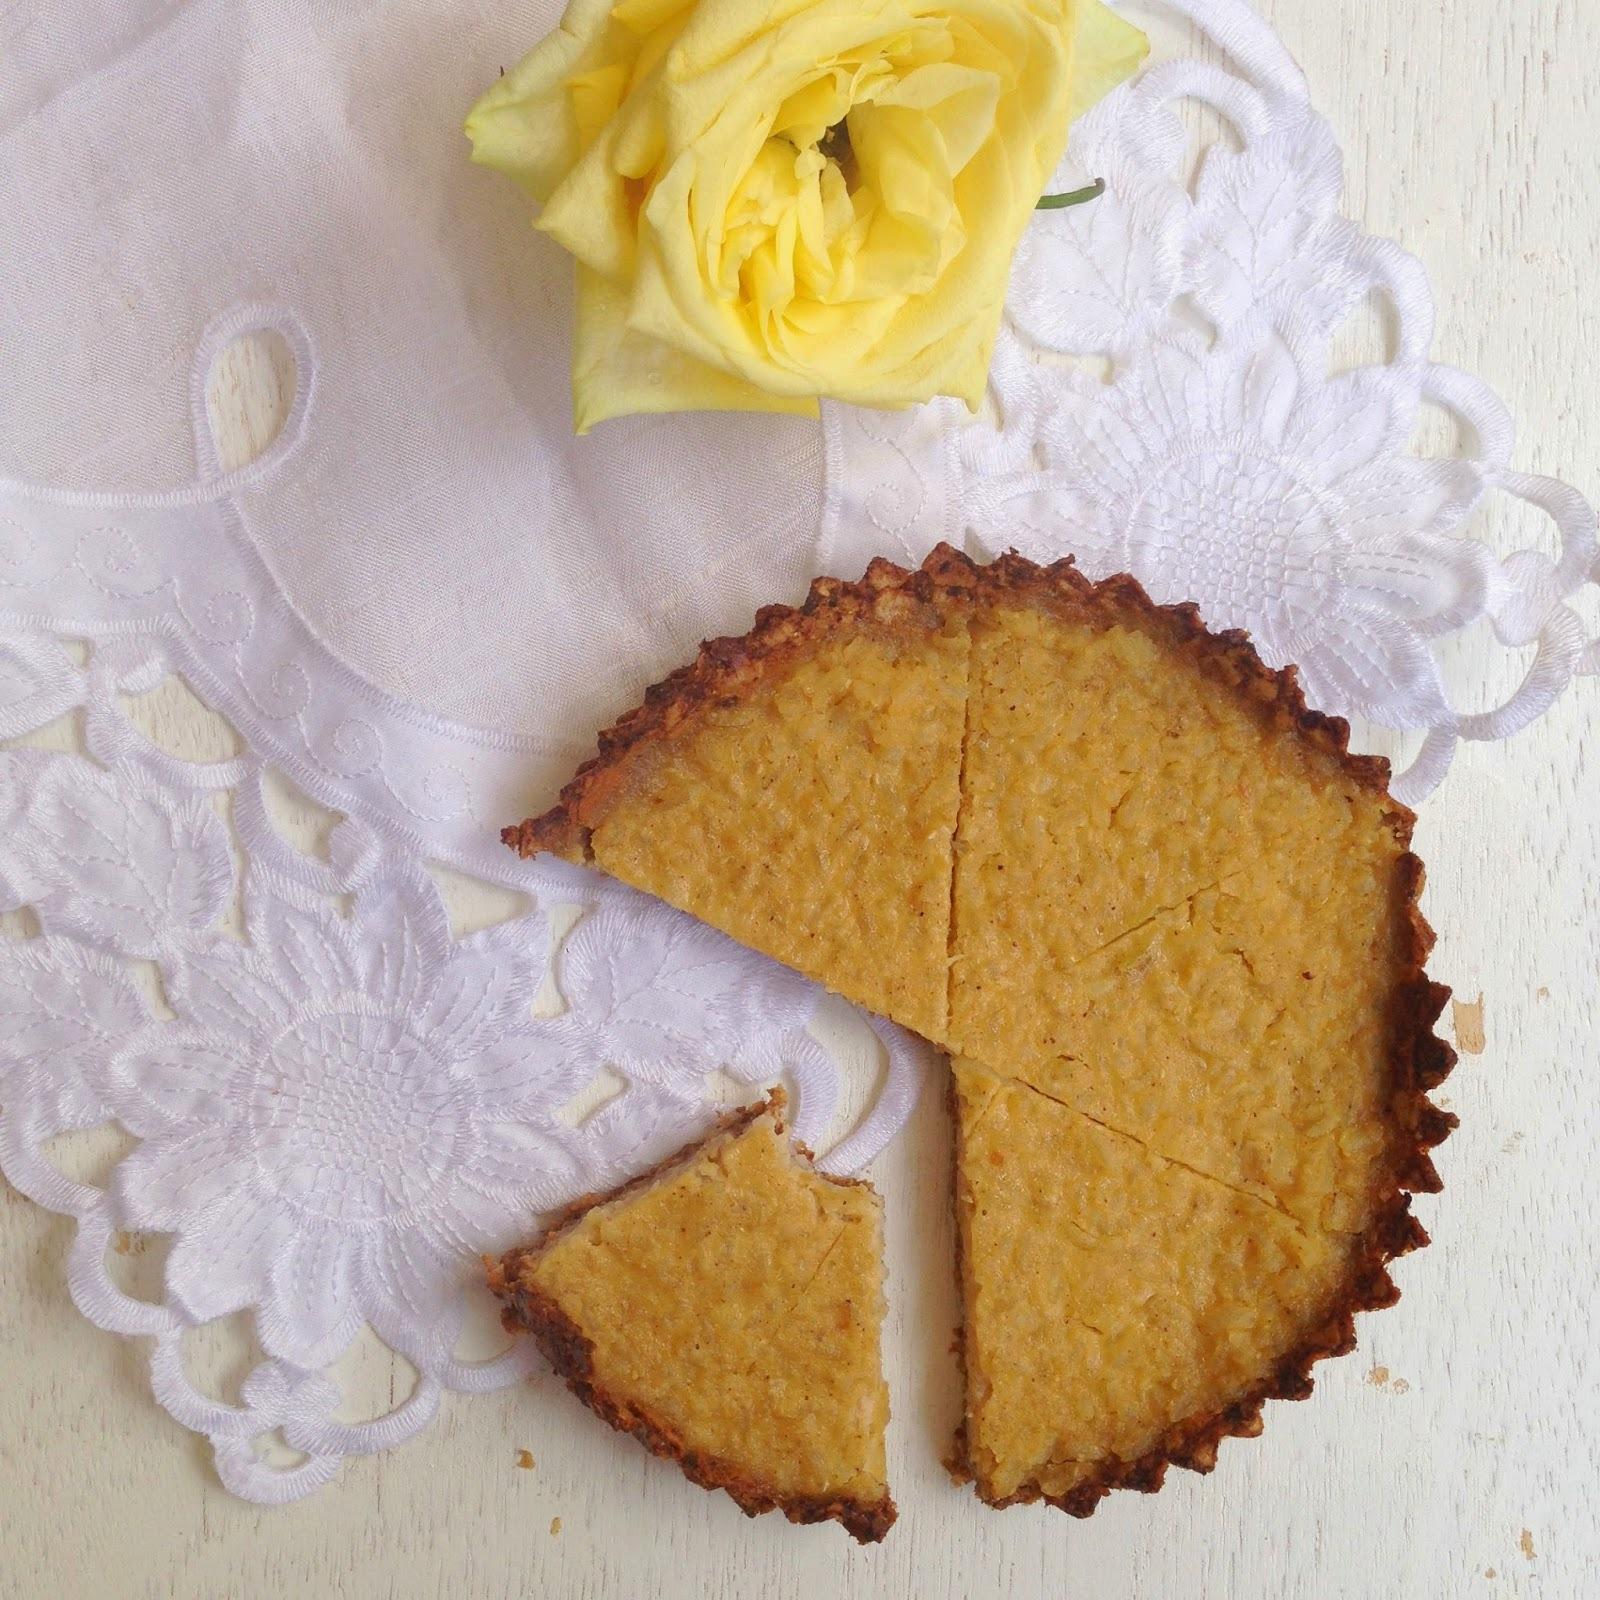 Semana de tartas y tortas: tarta de arroz integral